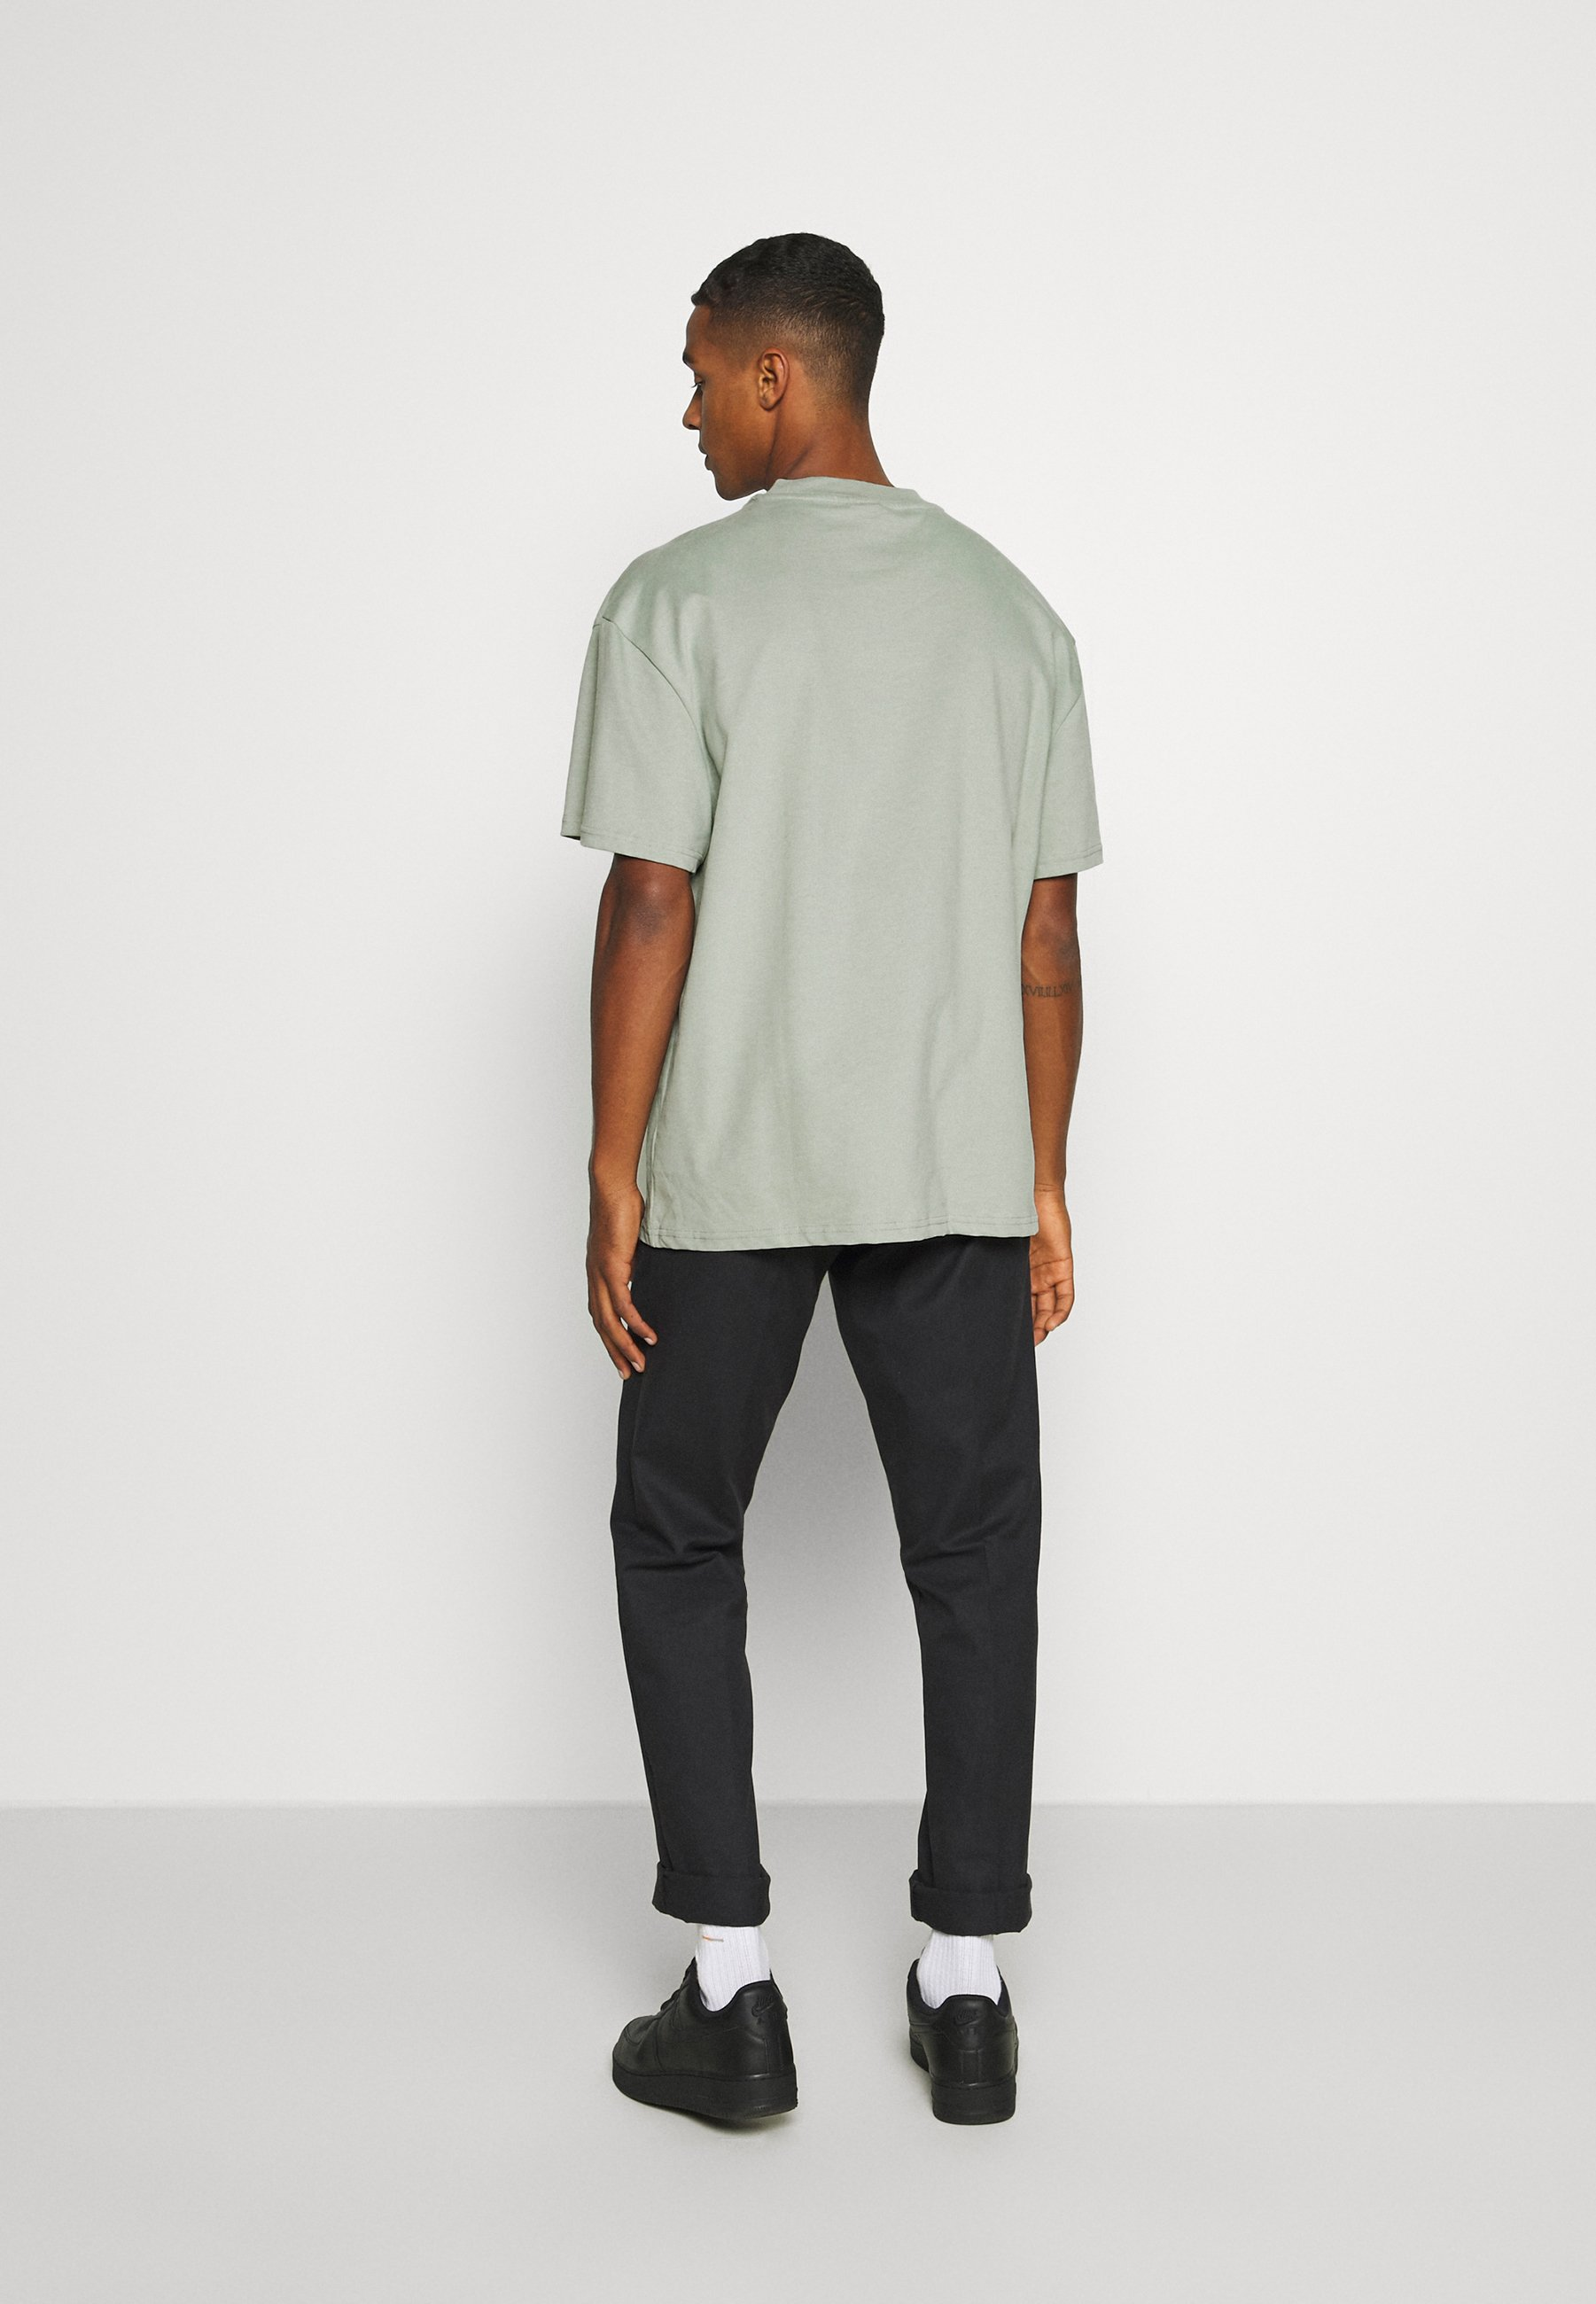 Weekday Great - T-shirts Sage Green/grønn